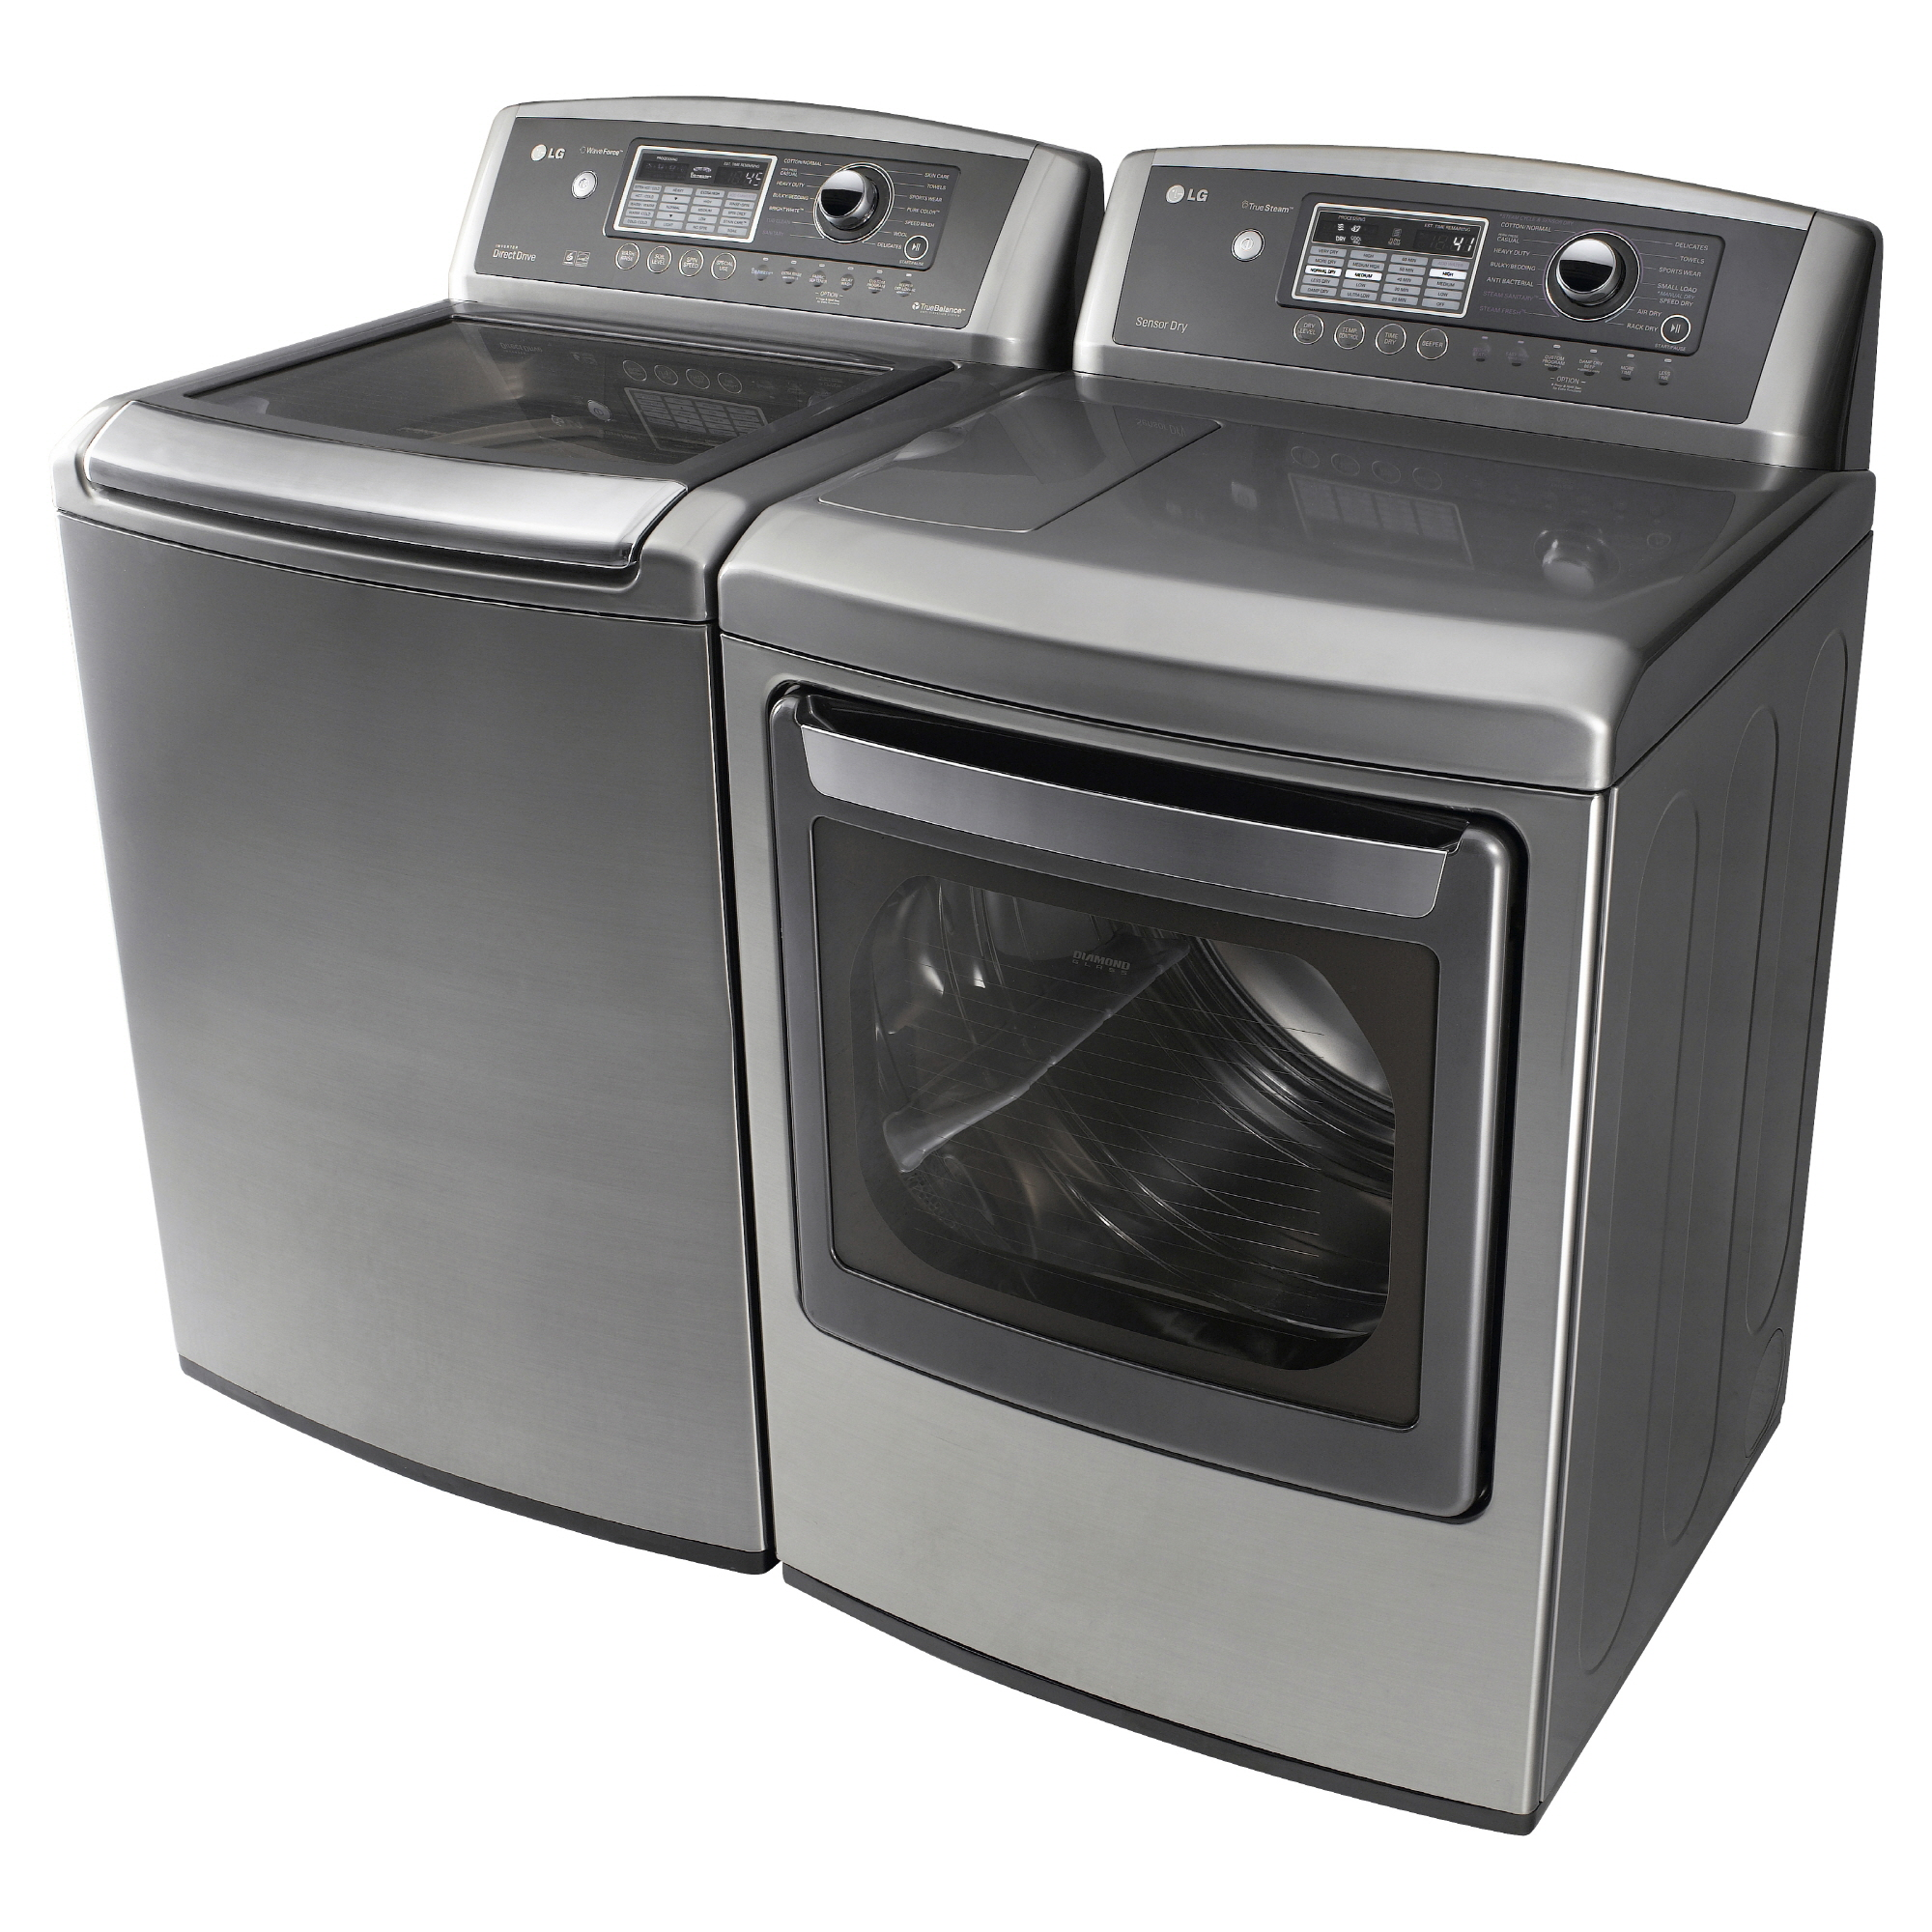 lg 39 s inverter direct drive technology raises bar for washing machines lg newsroom. Black Bedroom Furniture Sets. Home Design Ideas